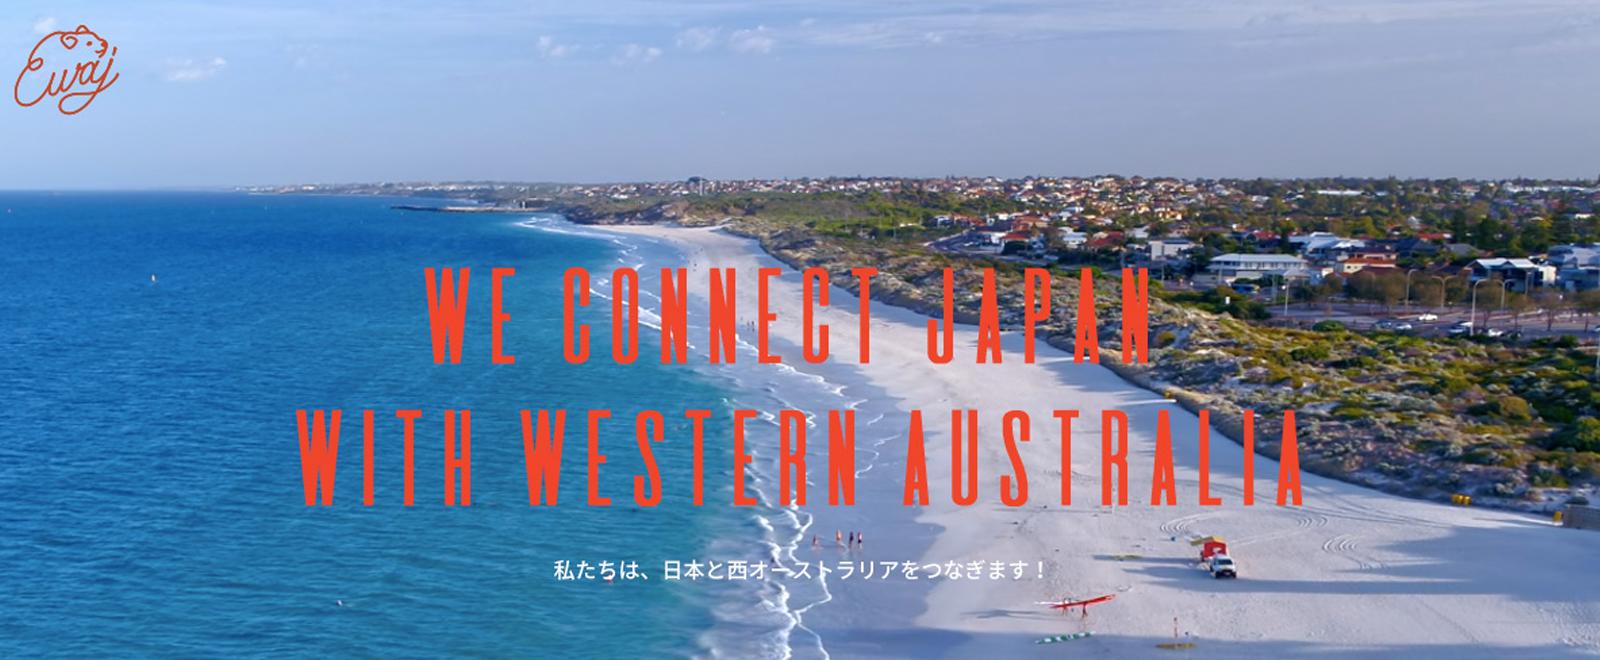 Experience Western Australia Japanコーポレートサイト